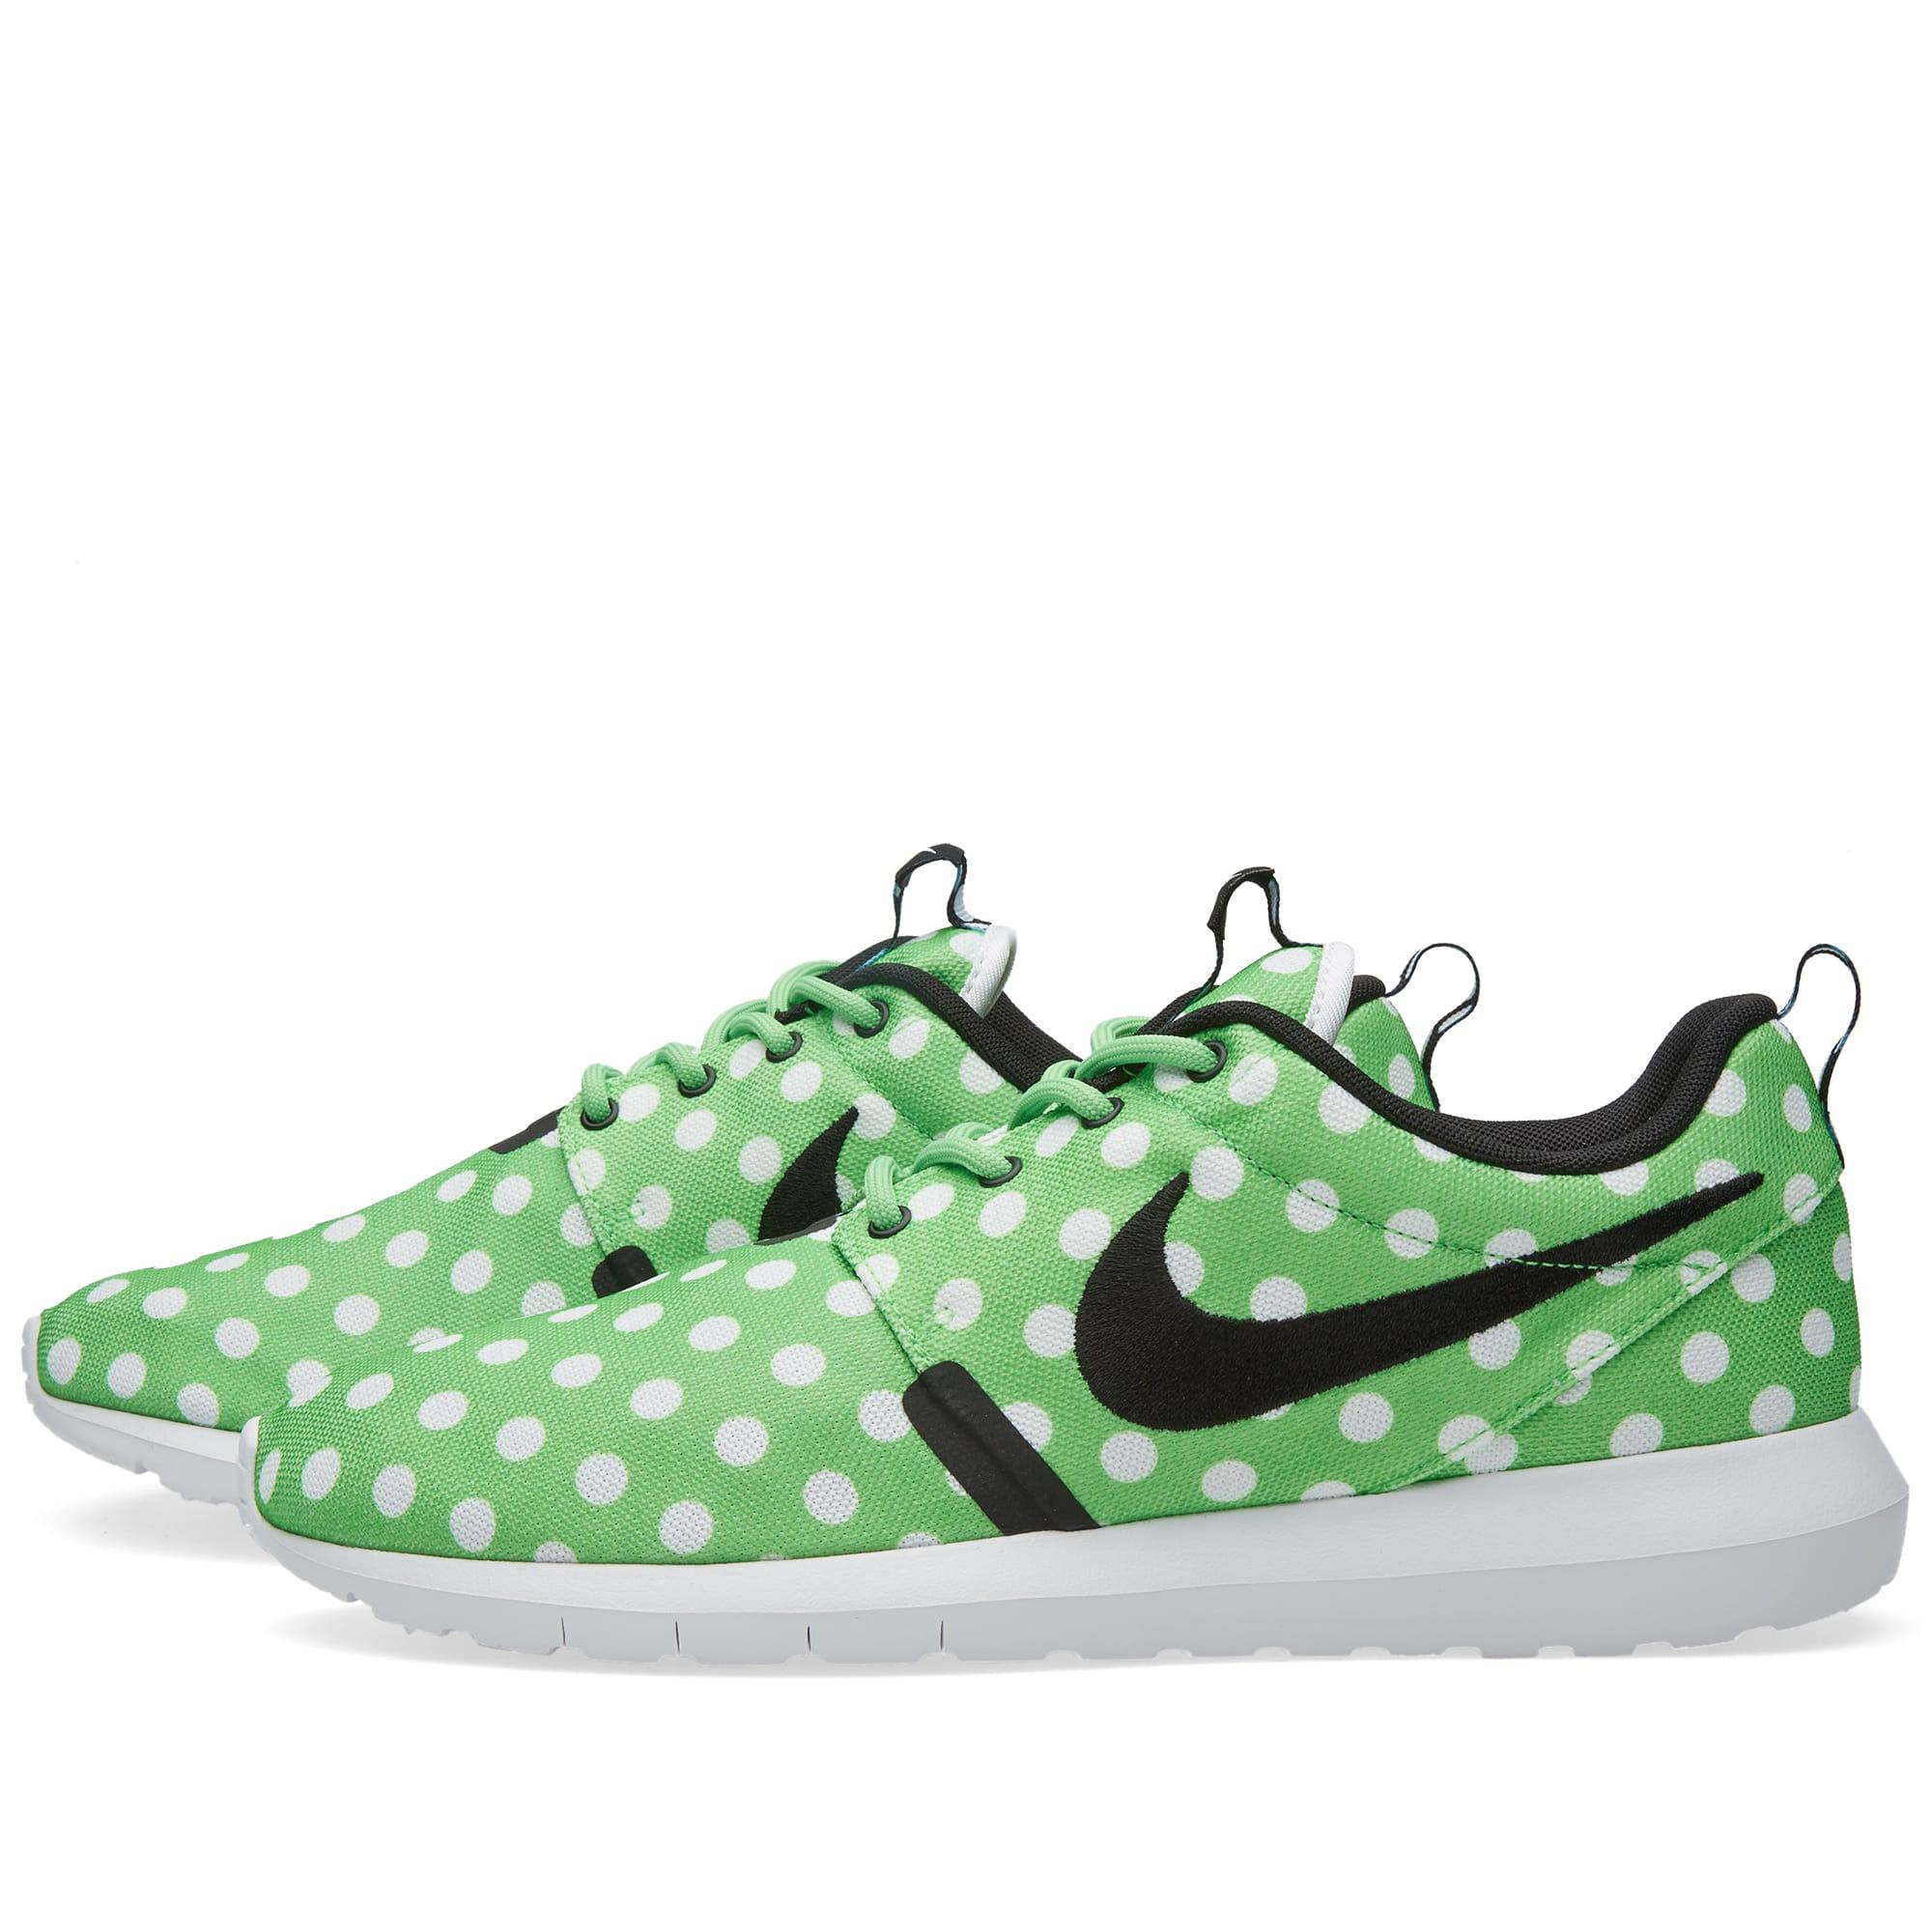 brand new 8cf30 c2155 Nike Roshe NM QS  Polka Dot  Green Strike, Black   White   END.